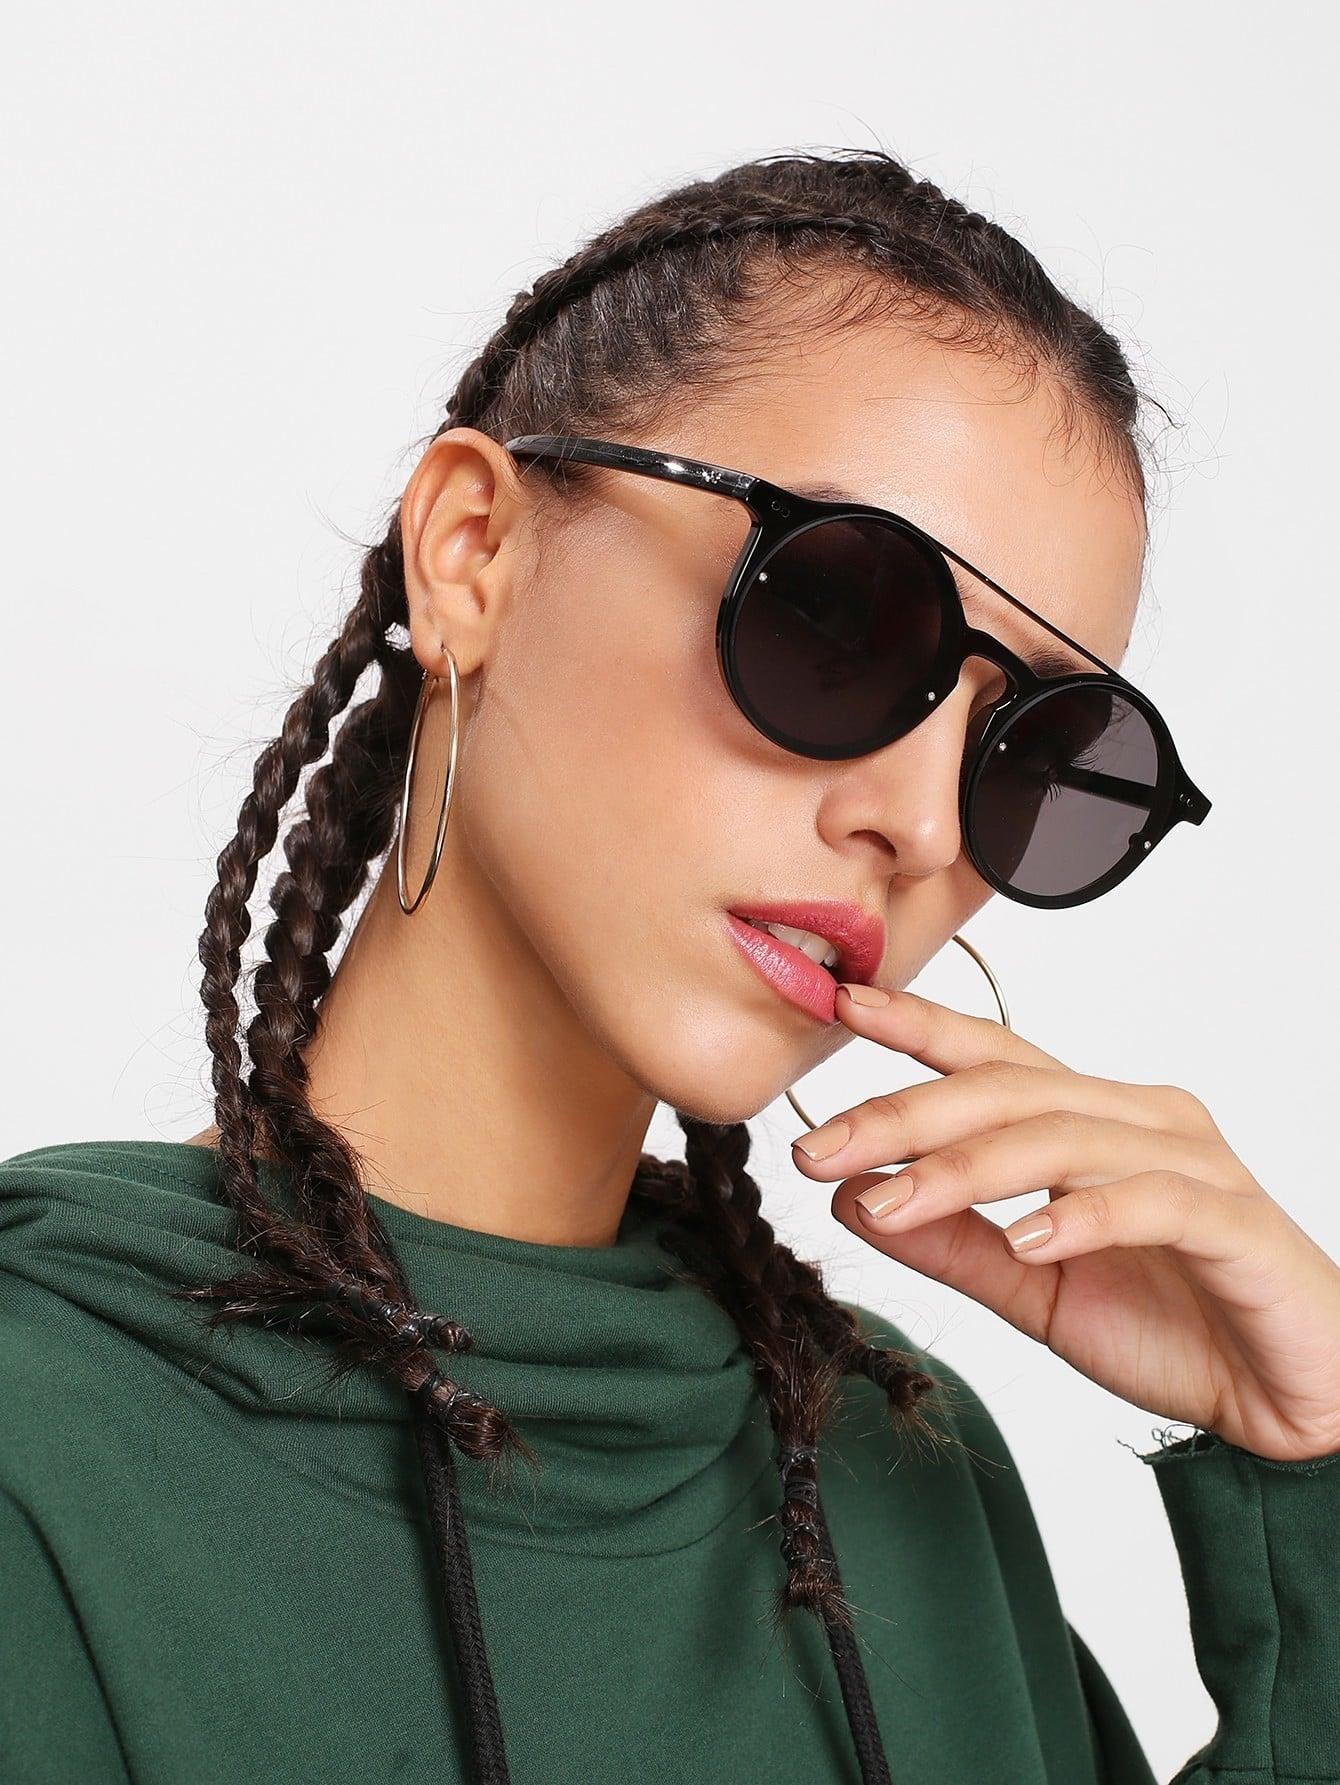 Double Bridge Round Lens Sunglasses qhx 7strings floyd rose tremolo bridge double locking pulled electric guitar bridge guitar accessories